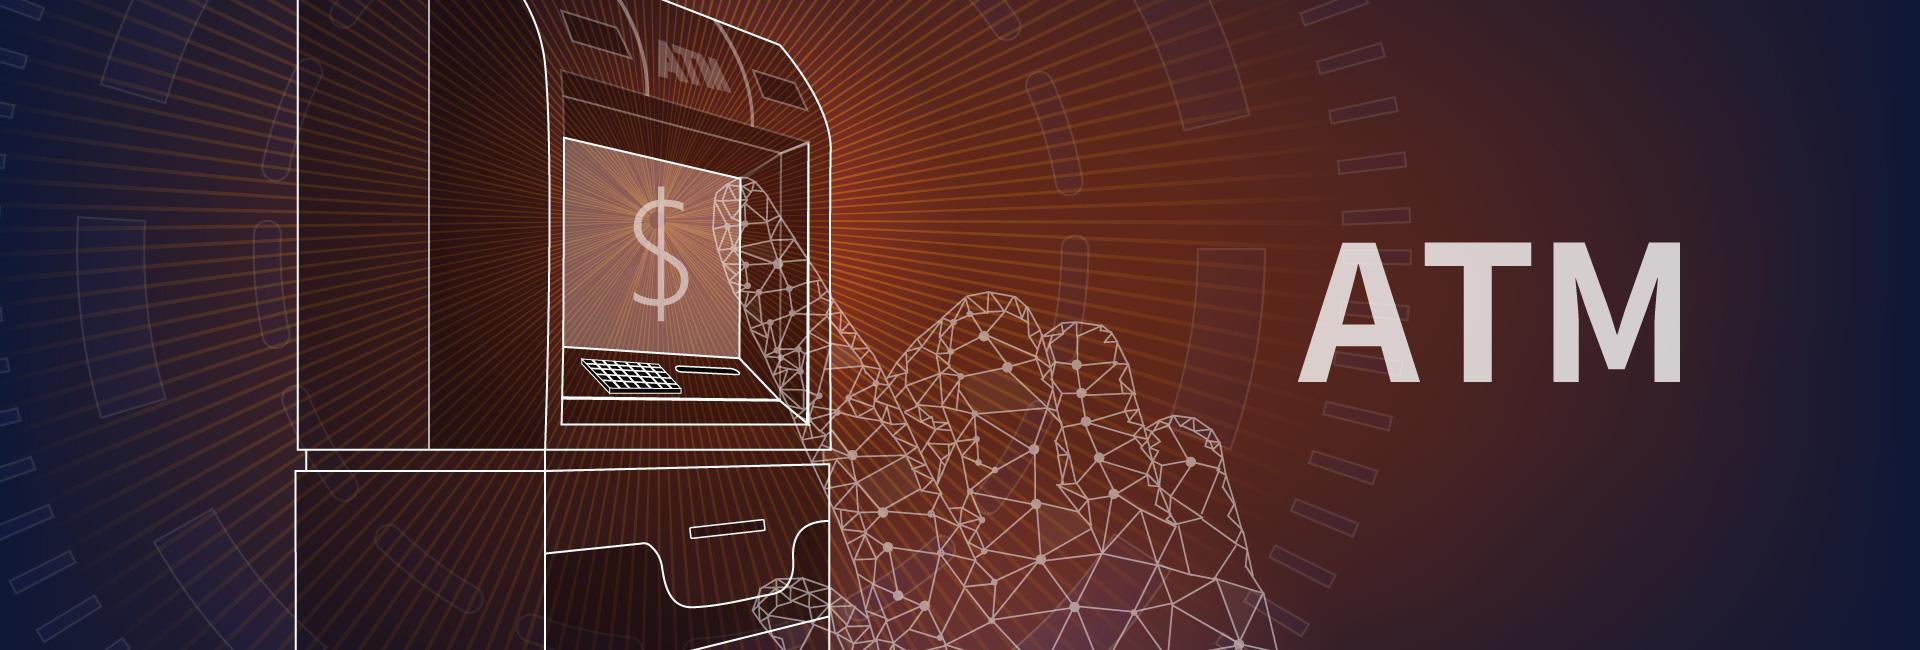 ATM (Automated Teller Machine) 自動櫃員機